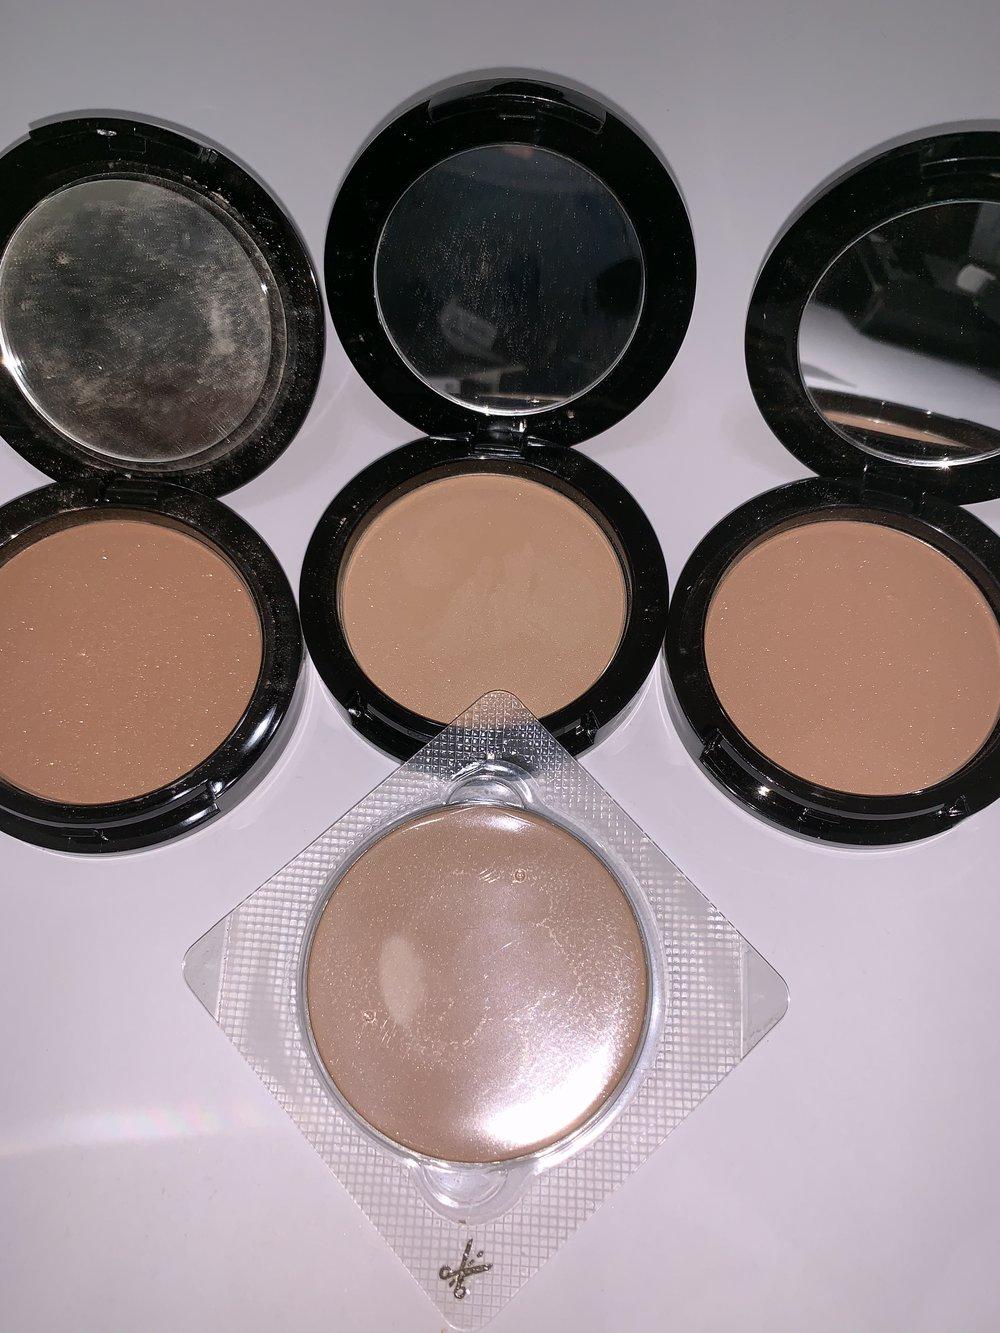 inglot53,54,56 and 18 pressed powder$25